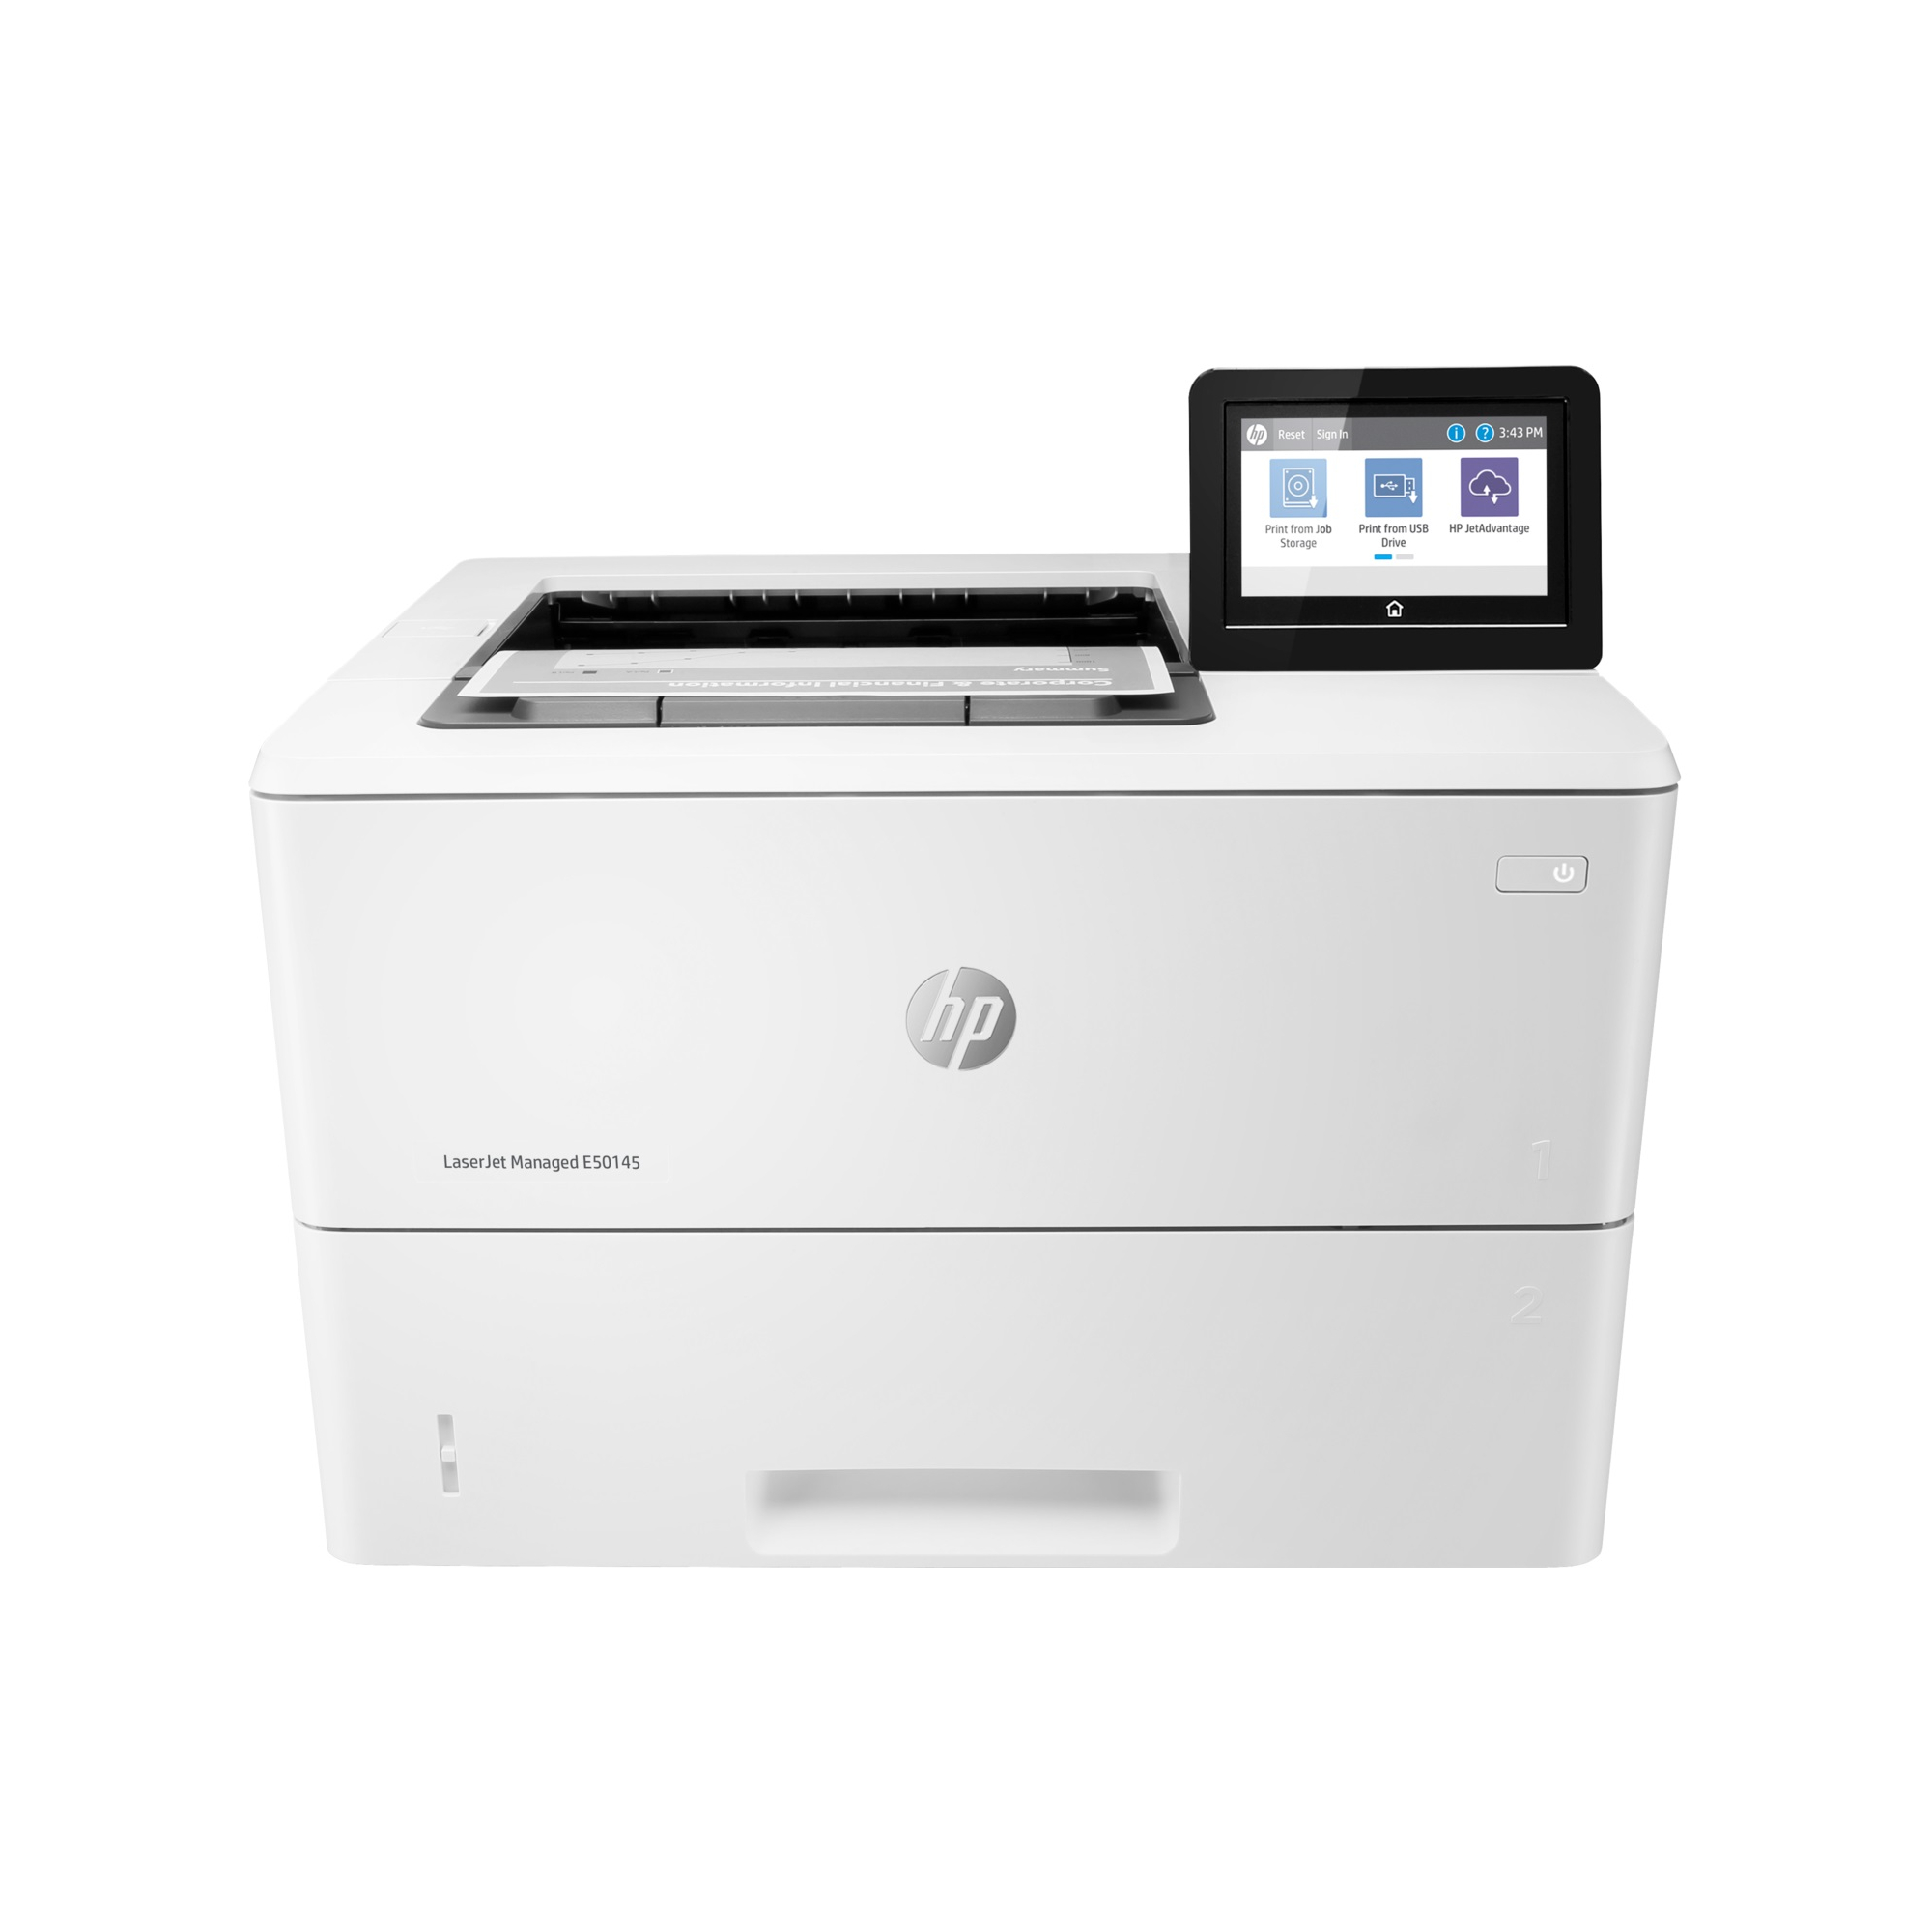 Noleggio Stampante HP LaserJet Managed E50145dn - Lyreco print services